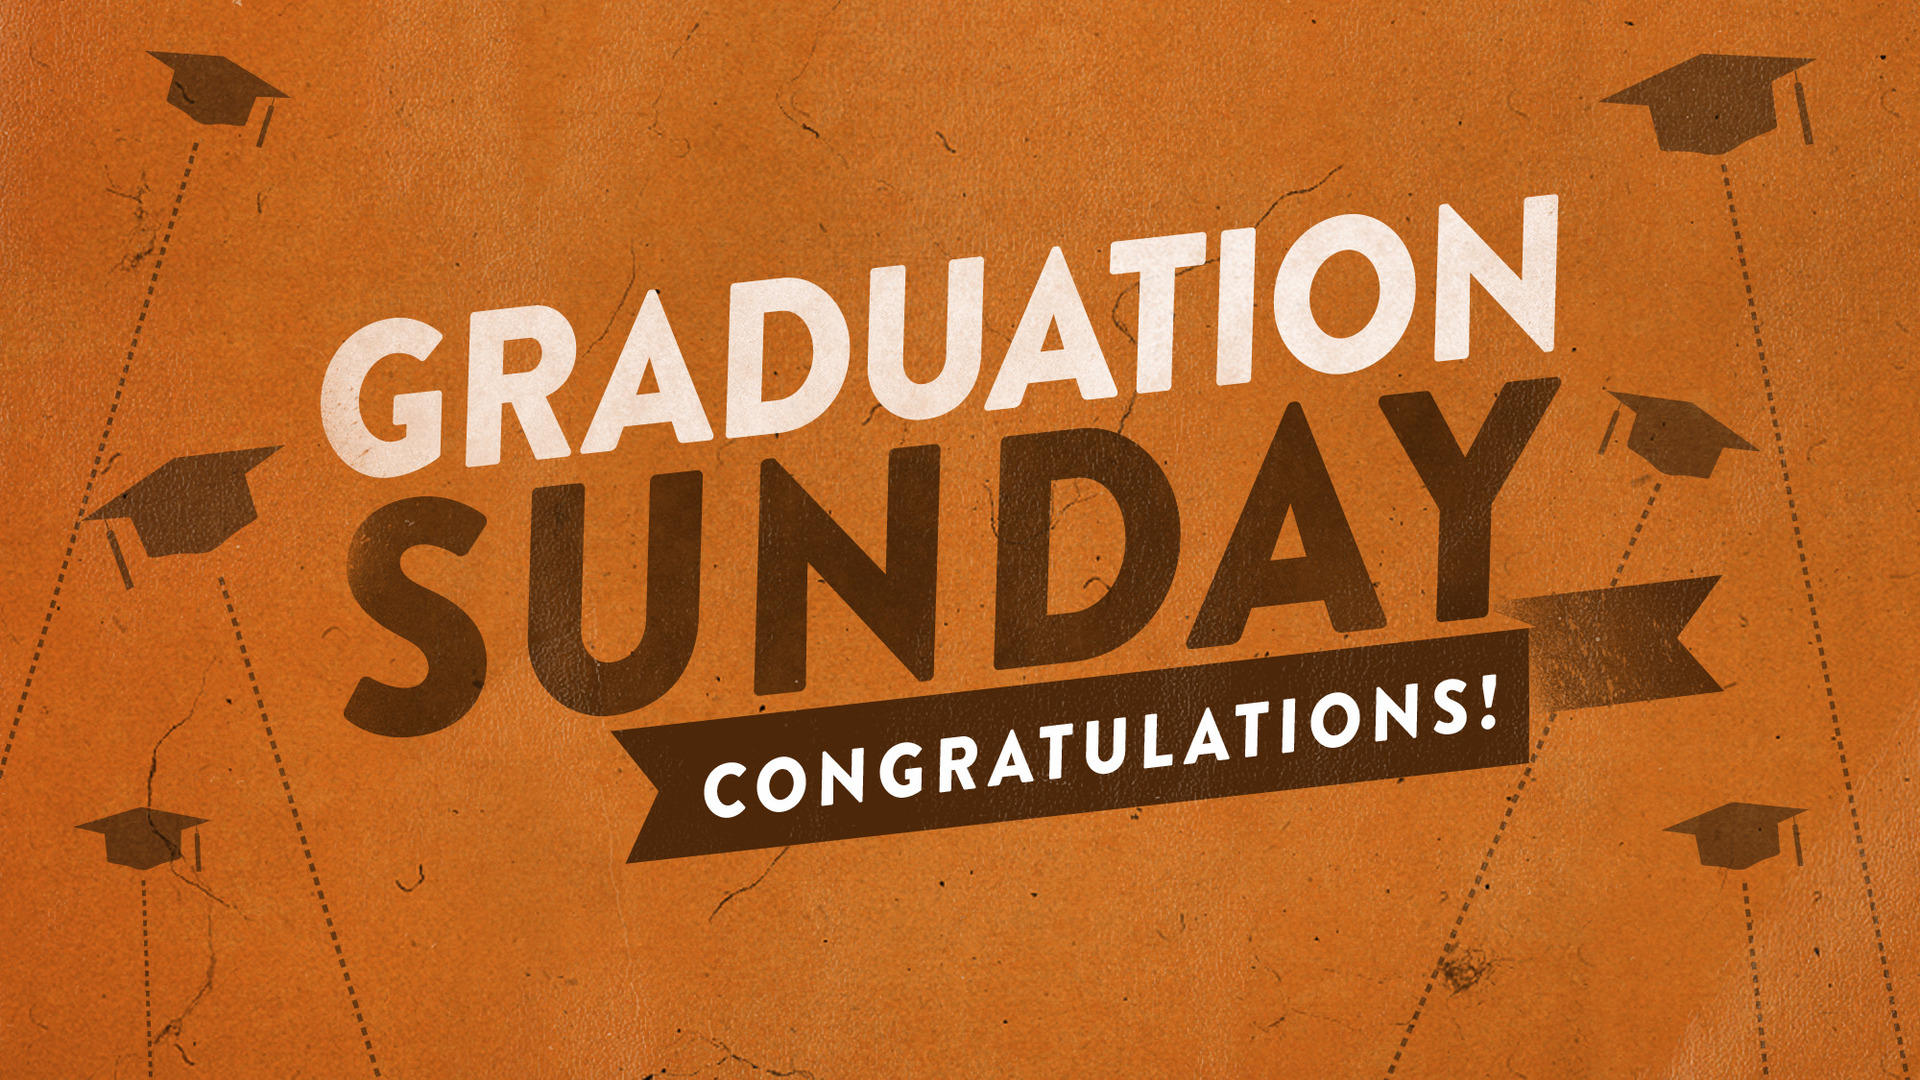 graduation_sunday-title-1-Wide 16x9.jpg